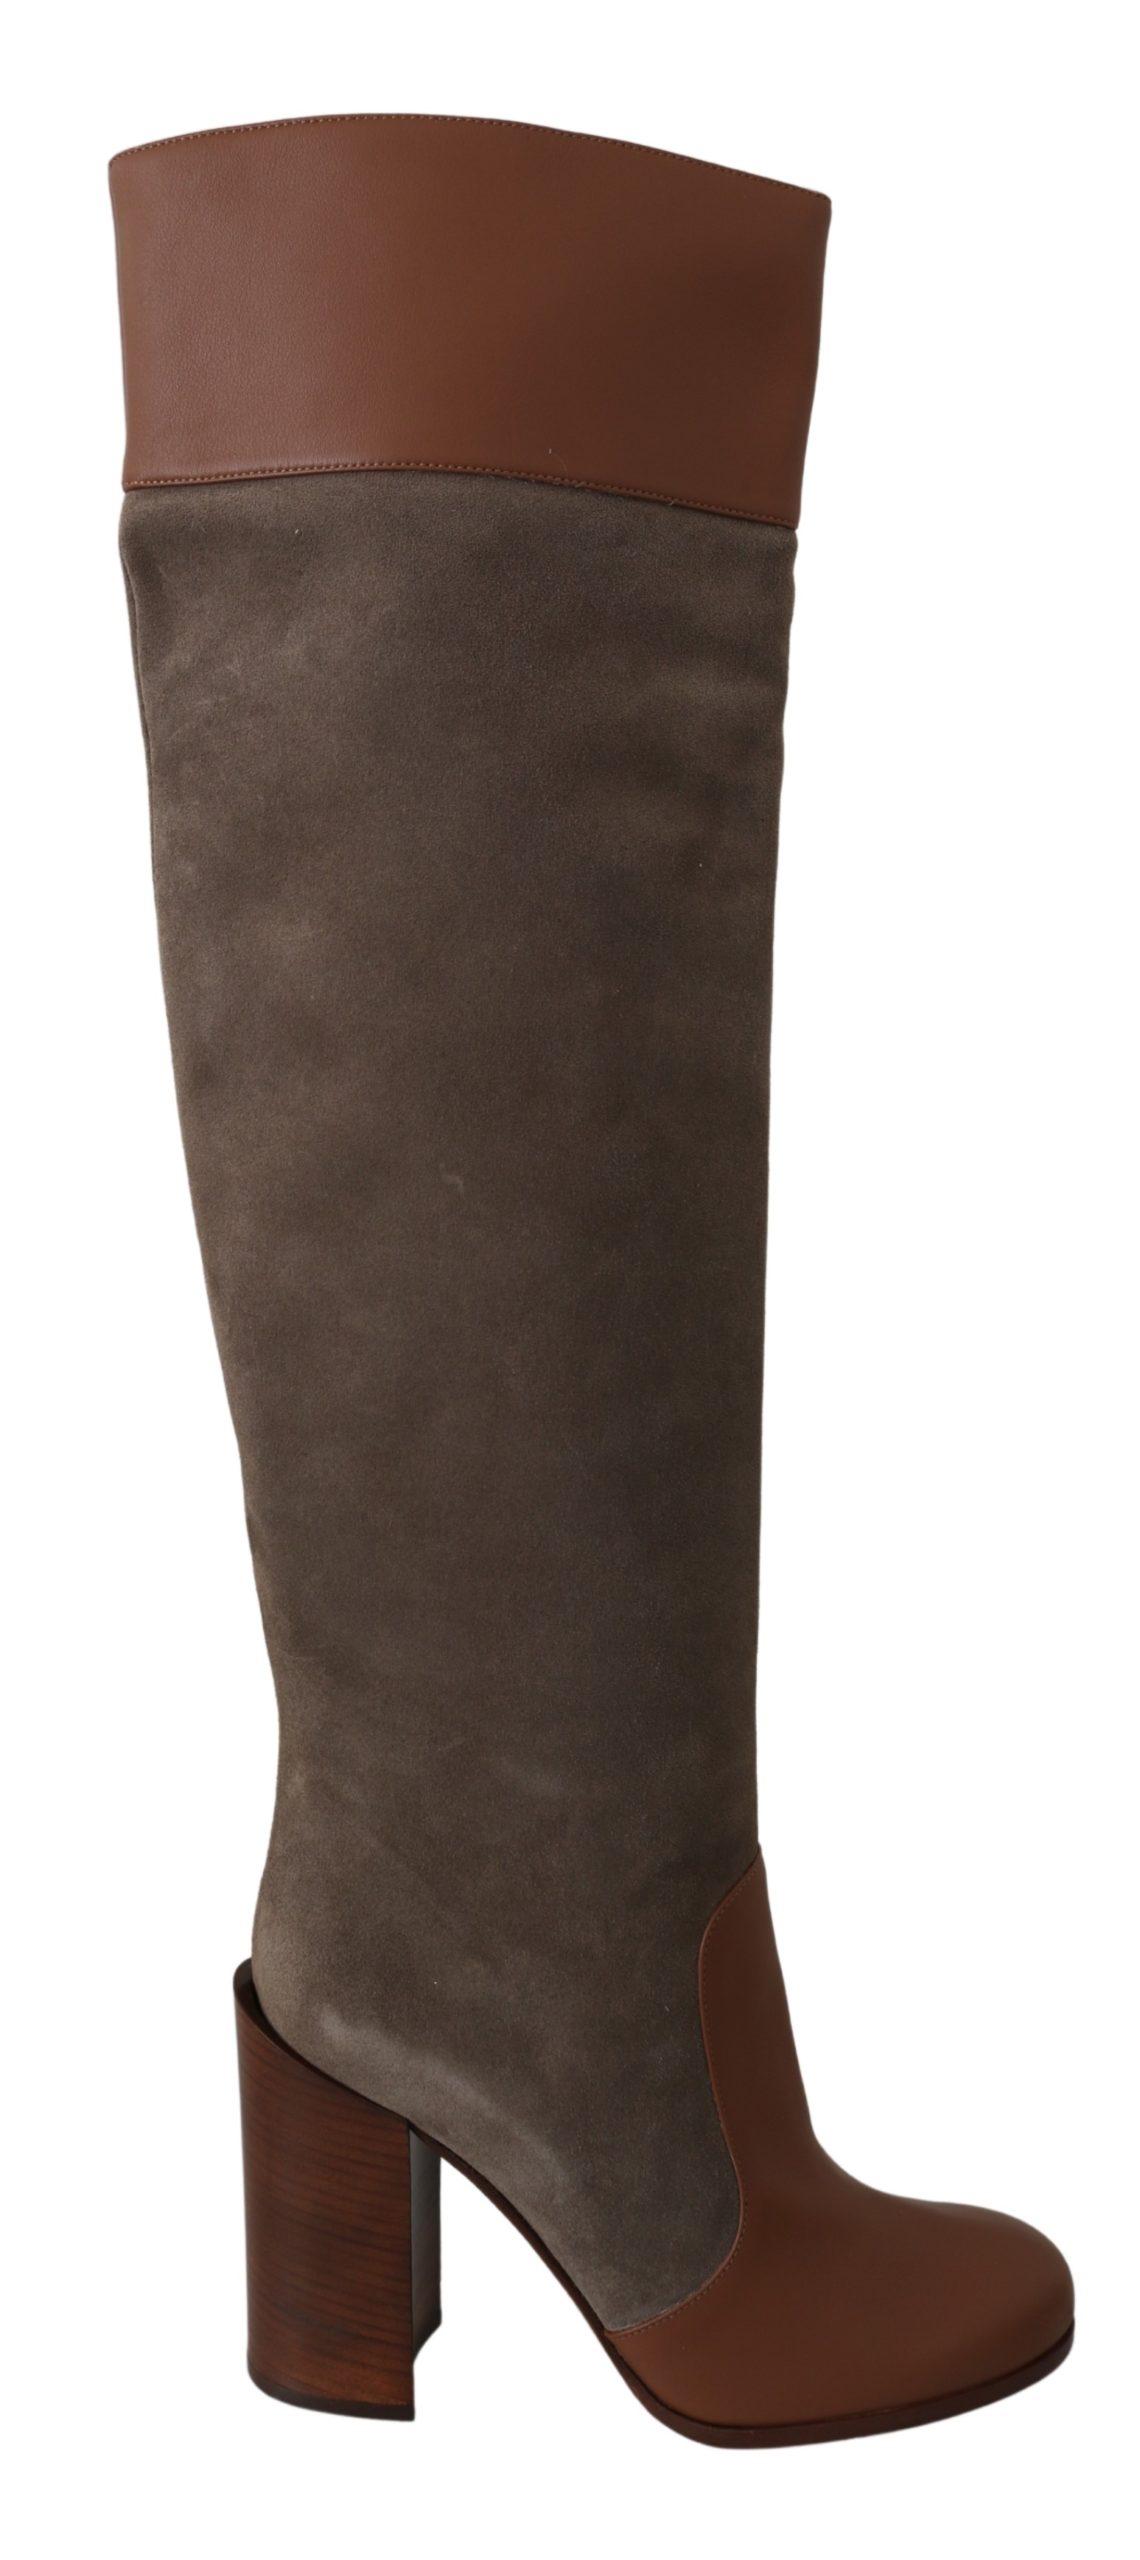 Dolce & Gabbana Women's Leather Knee High Boots Brown LA6696 - EU39/US8.5